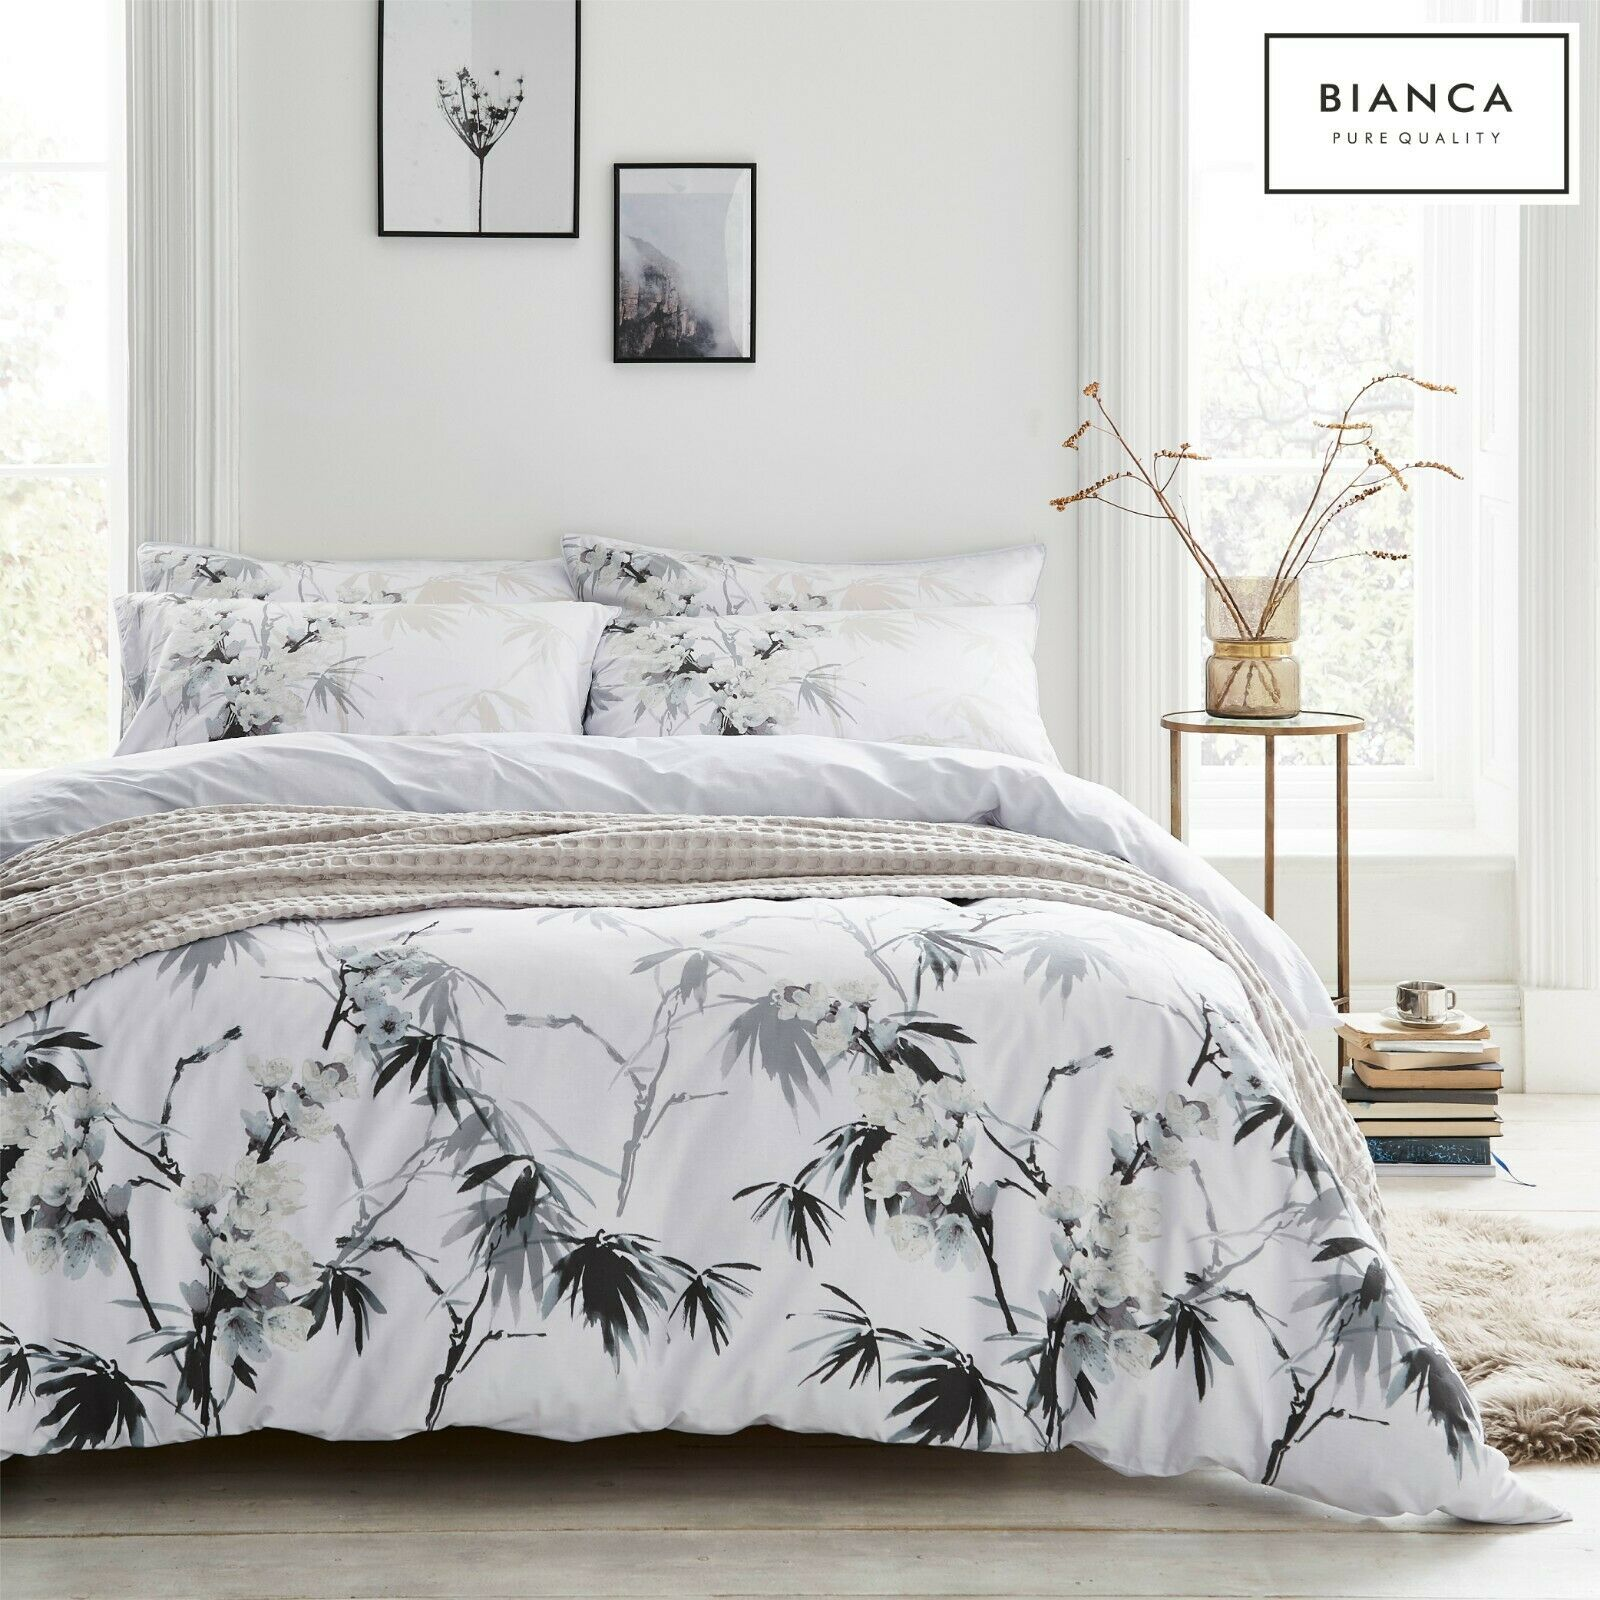 white KYOTO Light Floral 100% Cotton Soft Duvet Cover Quilt Cover Set Bedding